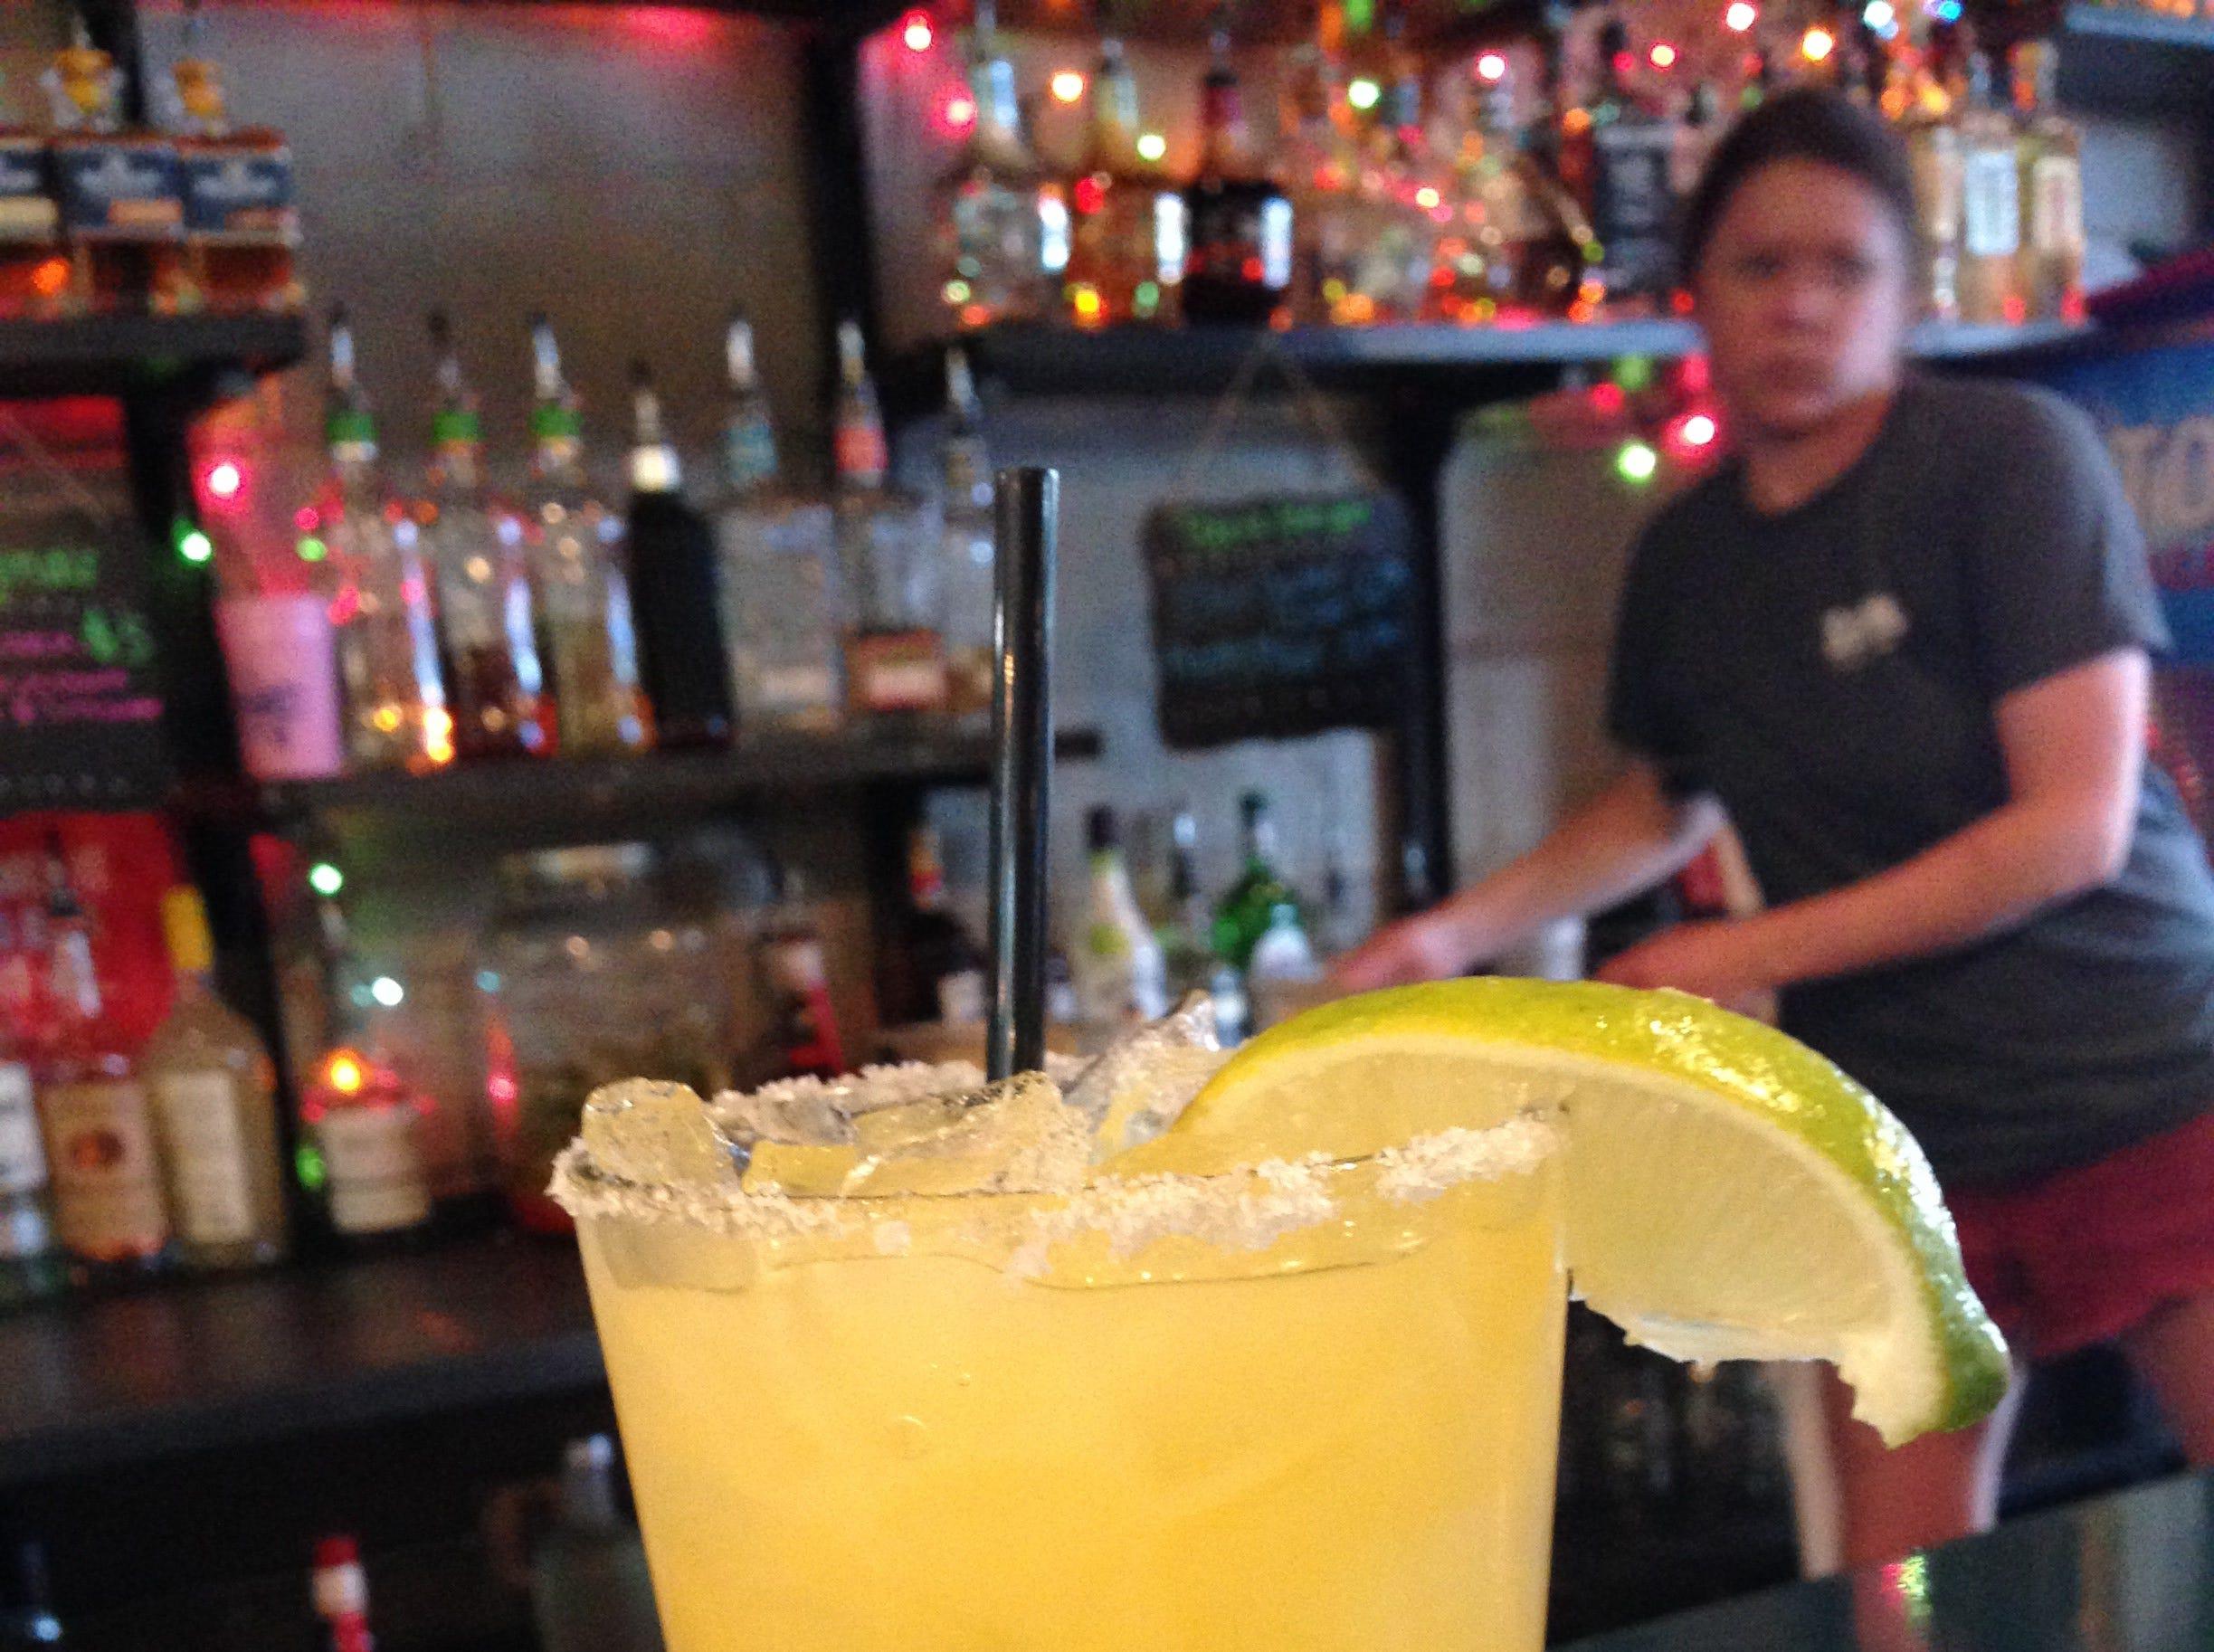 Bartender Beth Wolfe in action behind the bar at SoKno Taco Cantina, Aug. 2, 2018.